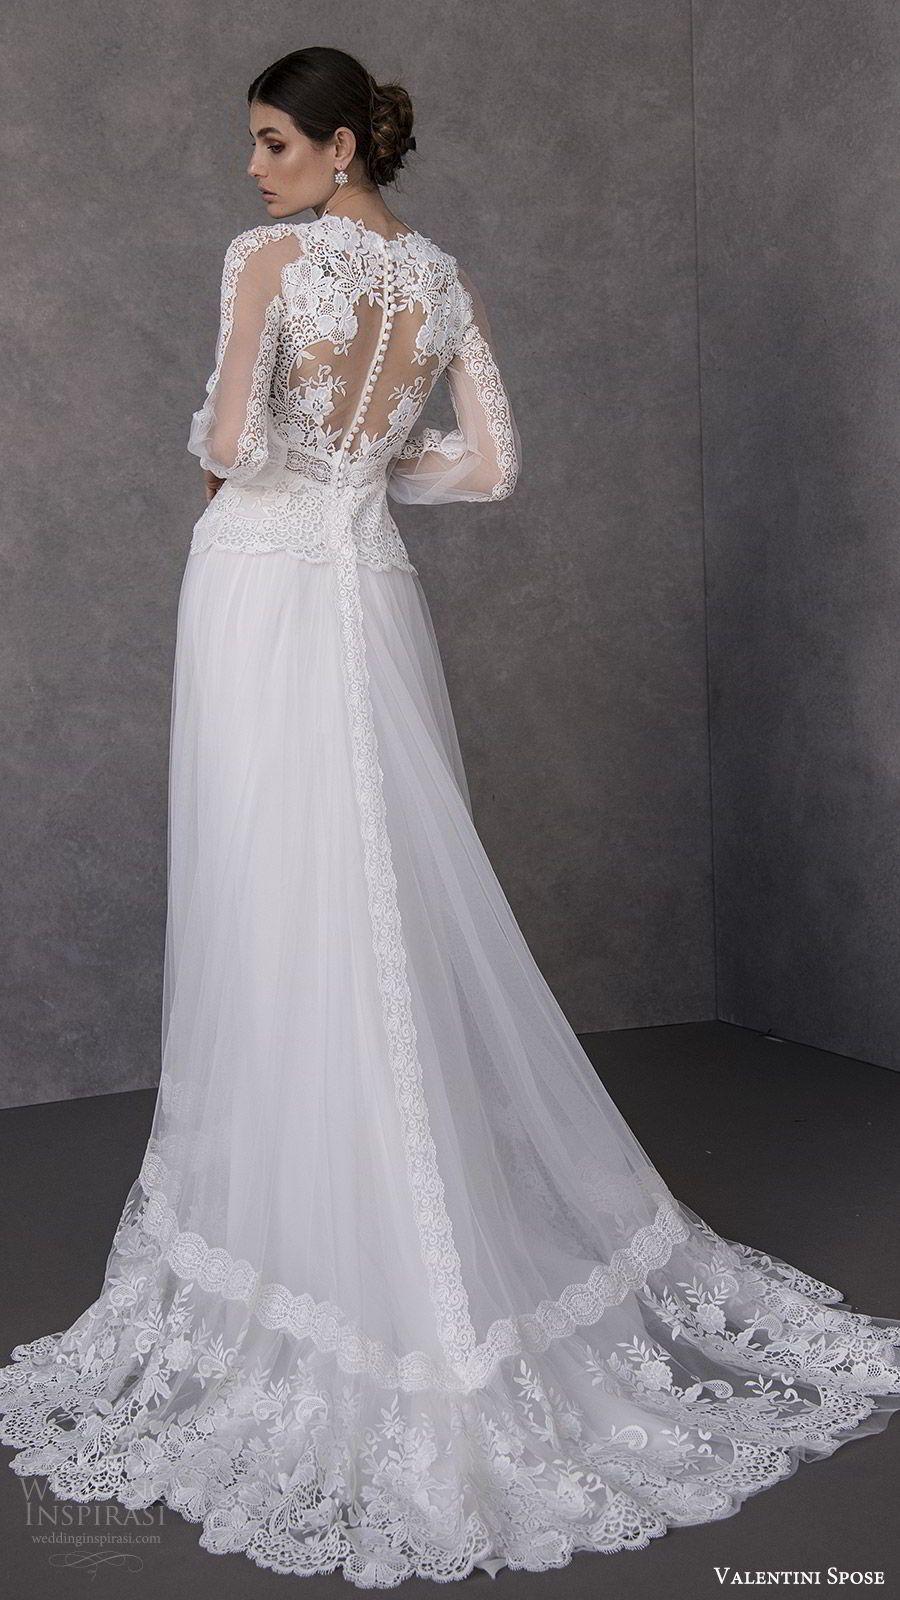 Valentini Spose Spring 2020 Wedding Dresses in 2020